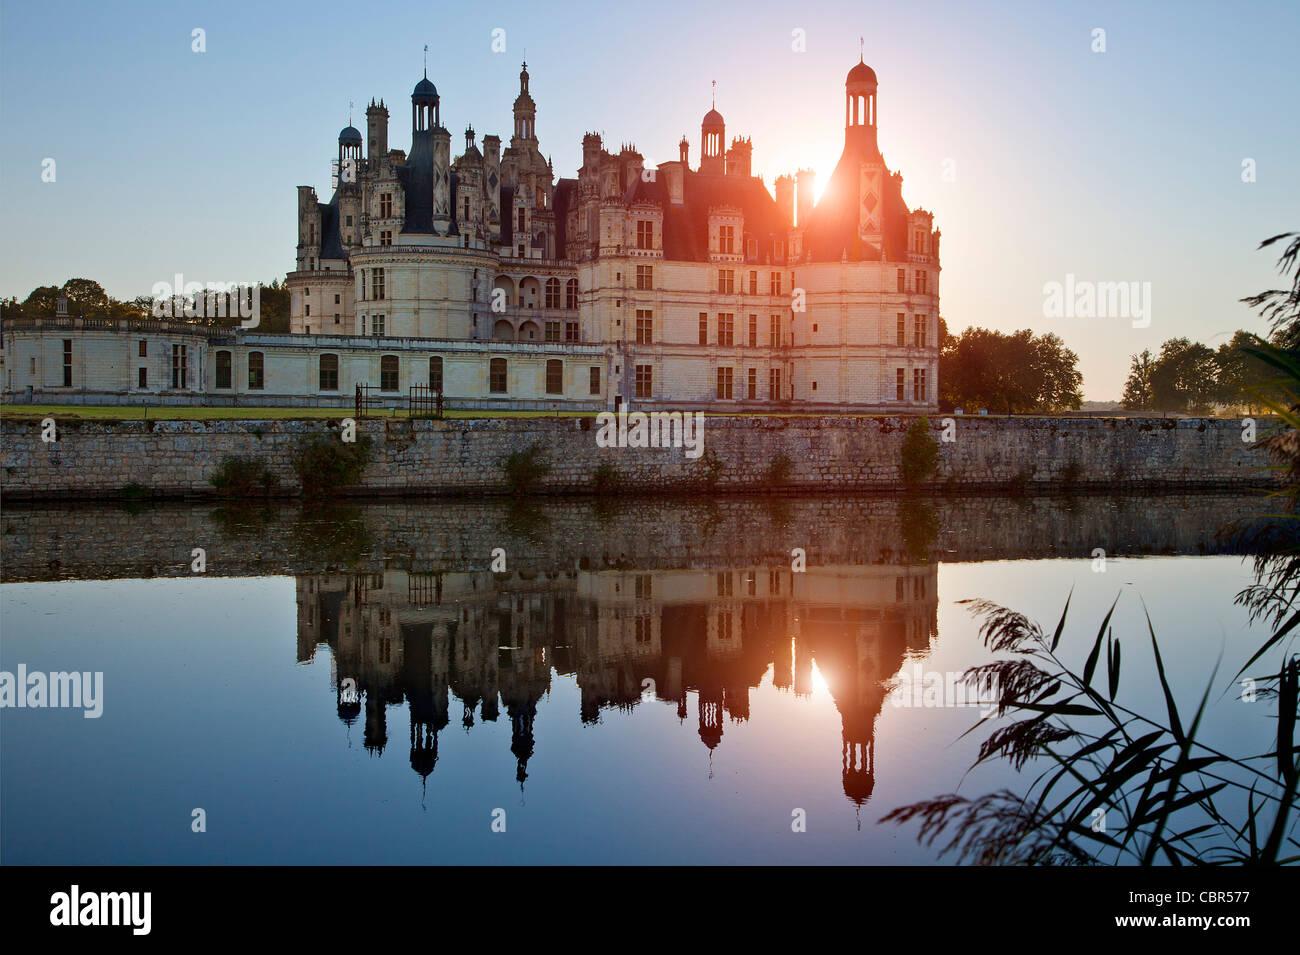 Loire Valley, Chateau de Chambord - Stock Image